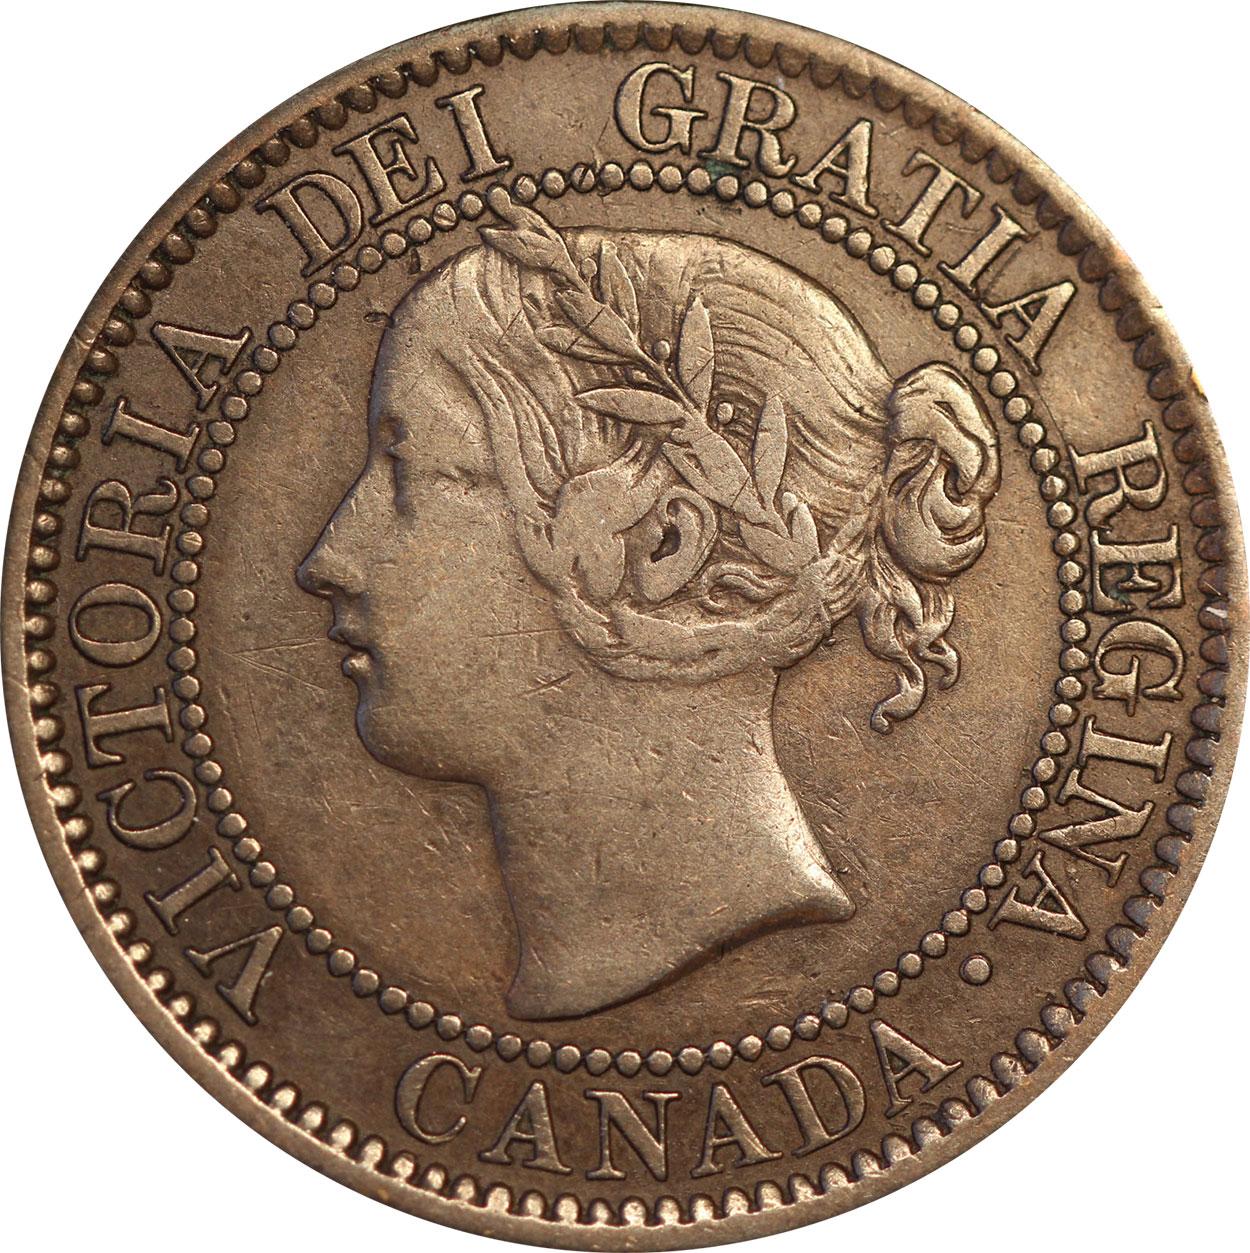 F-12 - 1 cent 1858 and 1859 - Victoria